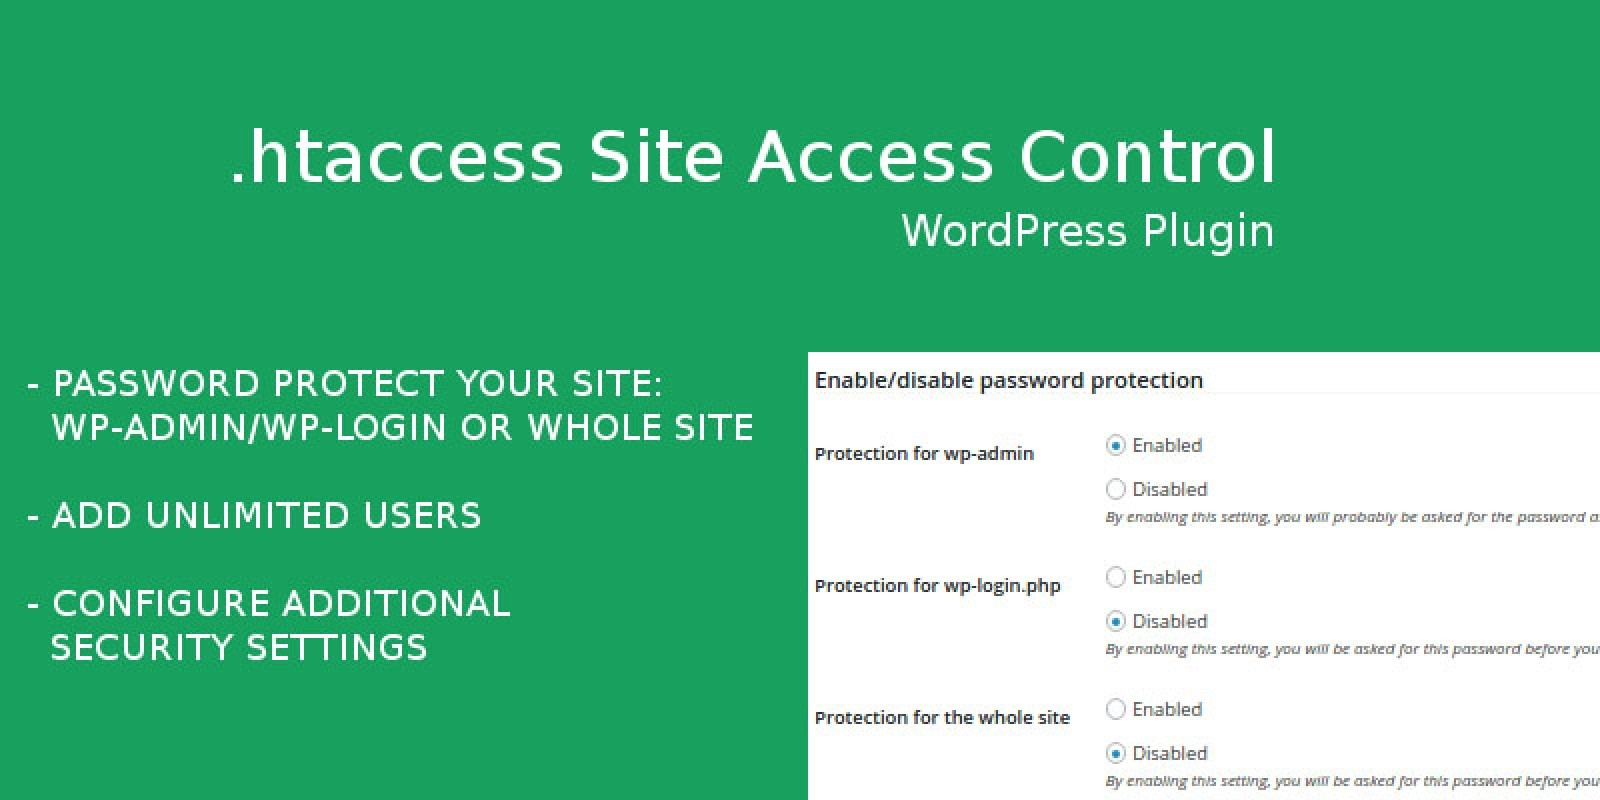 htaccess Site Access Control - WordPress Plugin